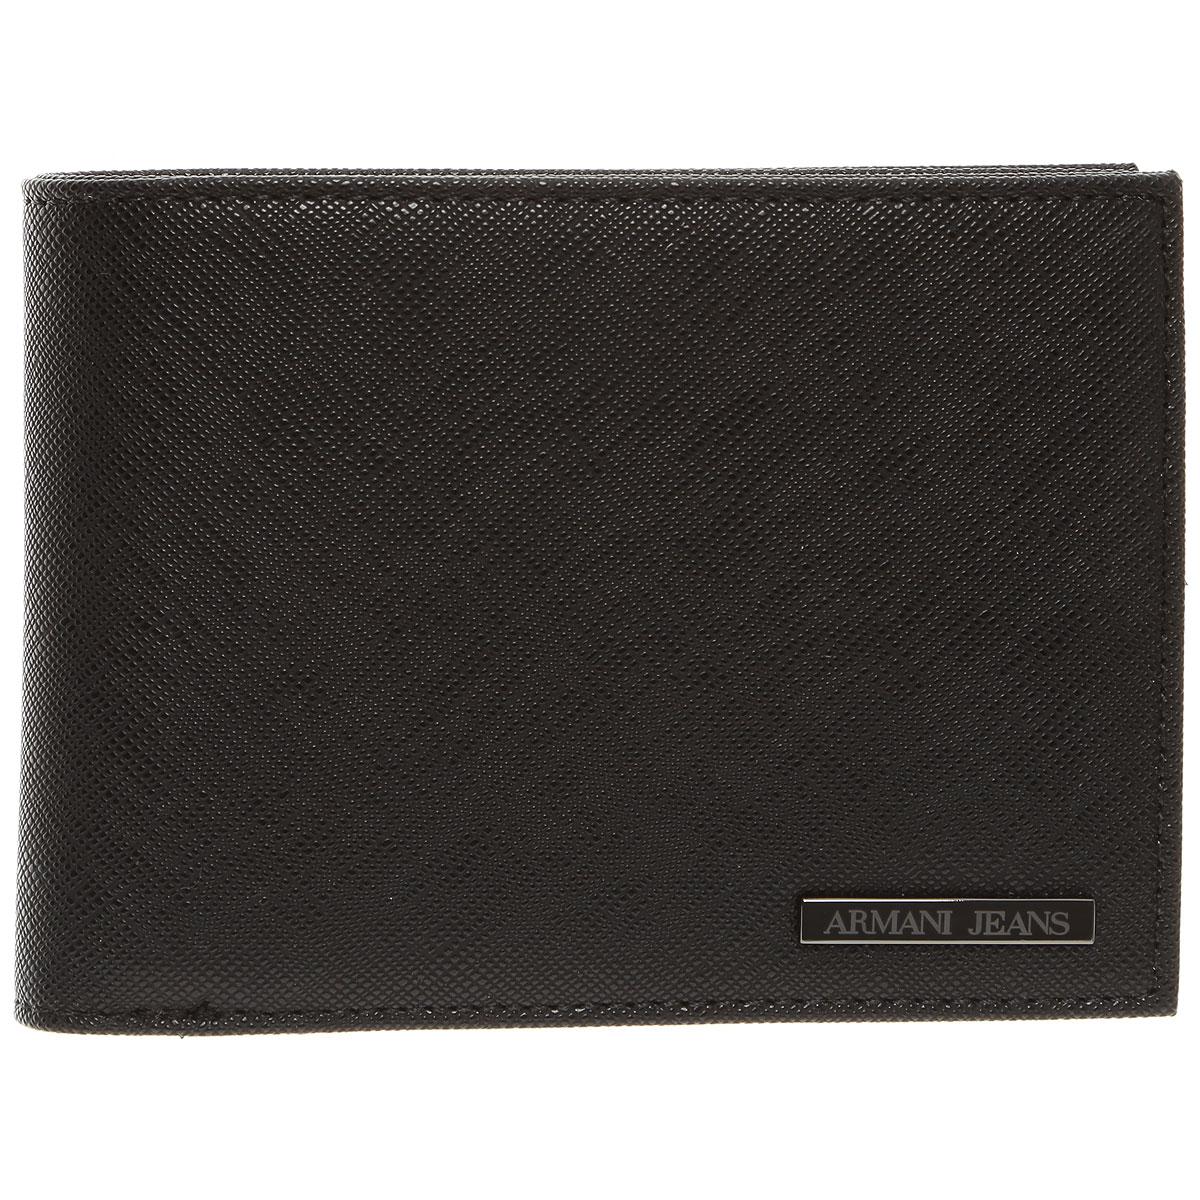 Image of Armani Jeans Wallet for Men, Black, Leather, 2017